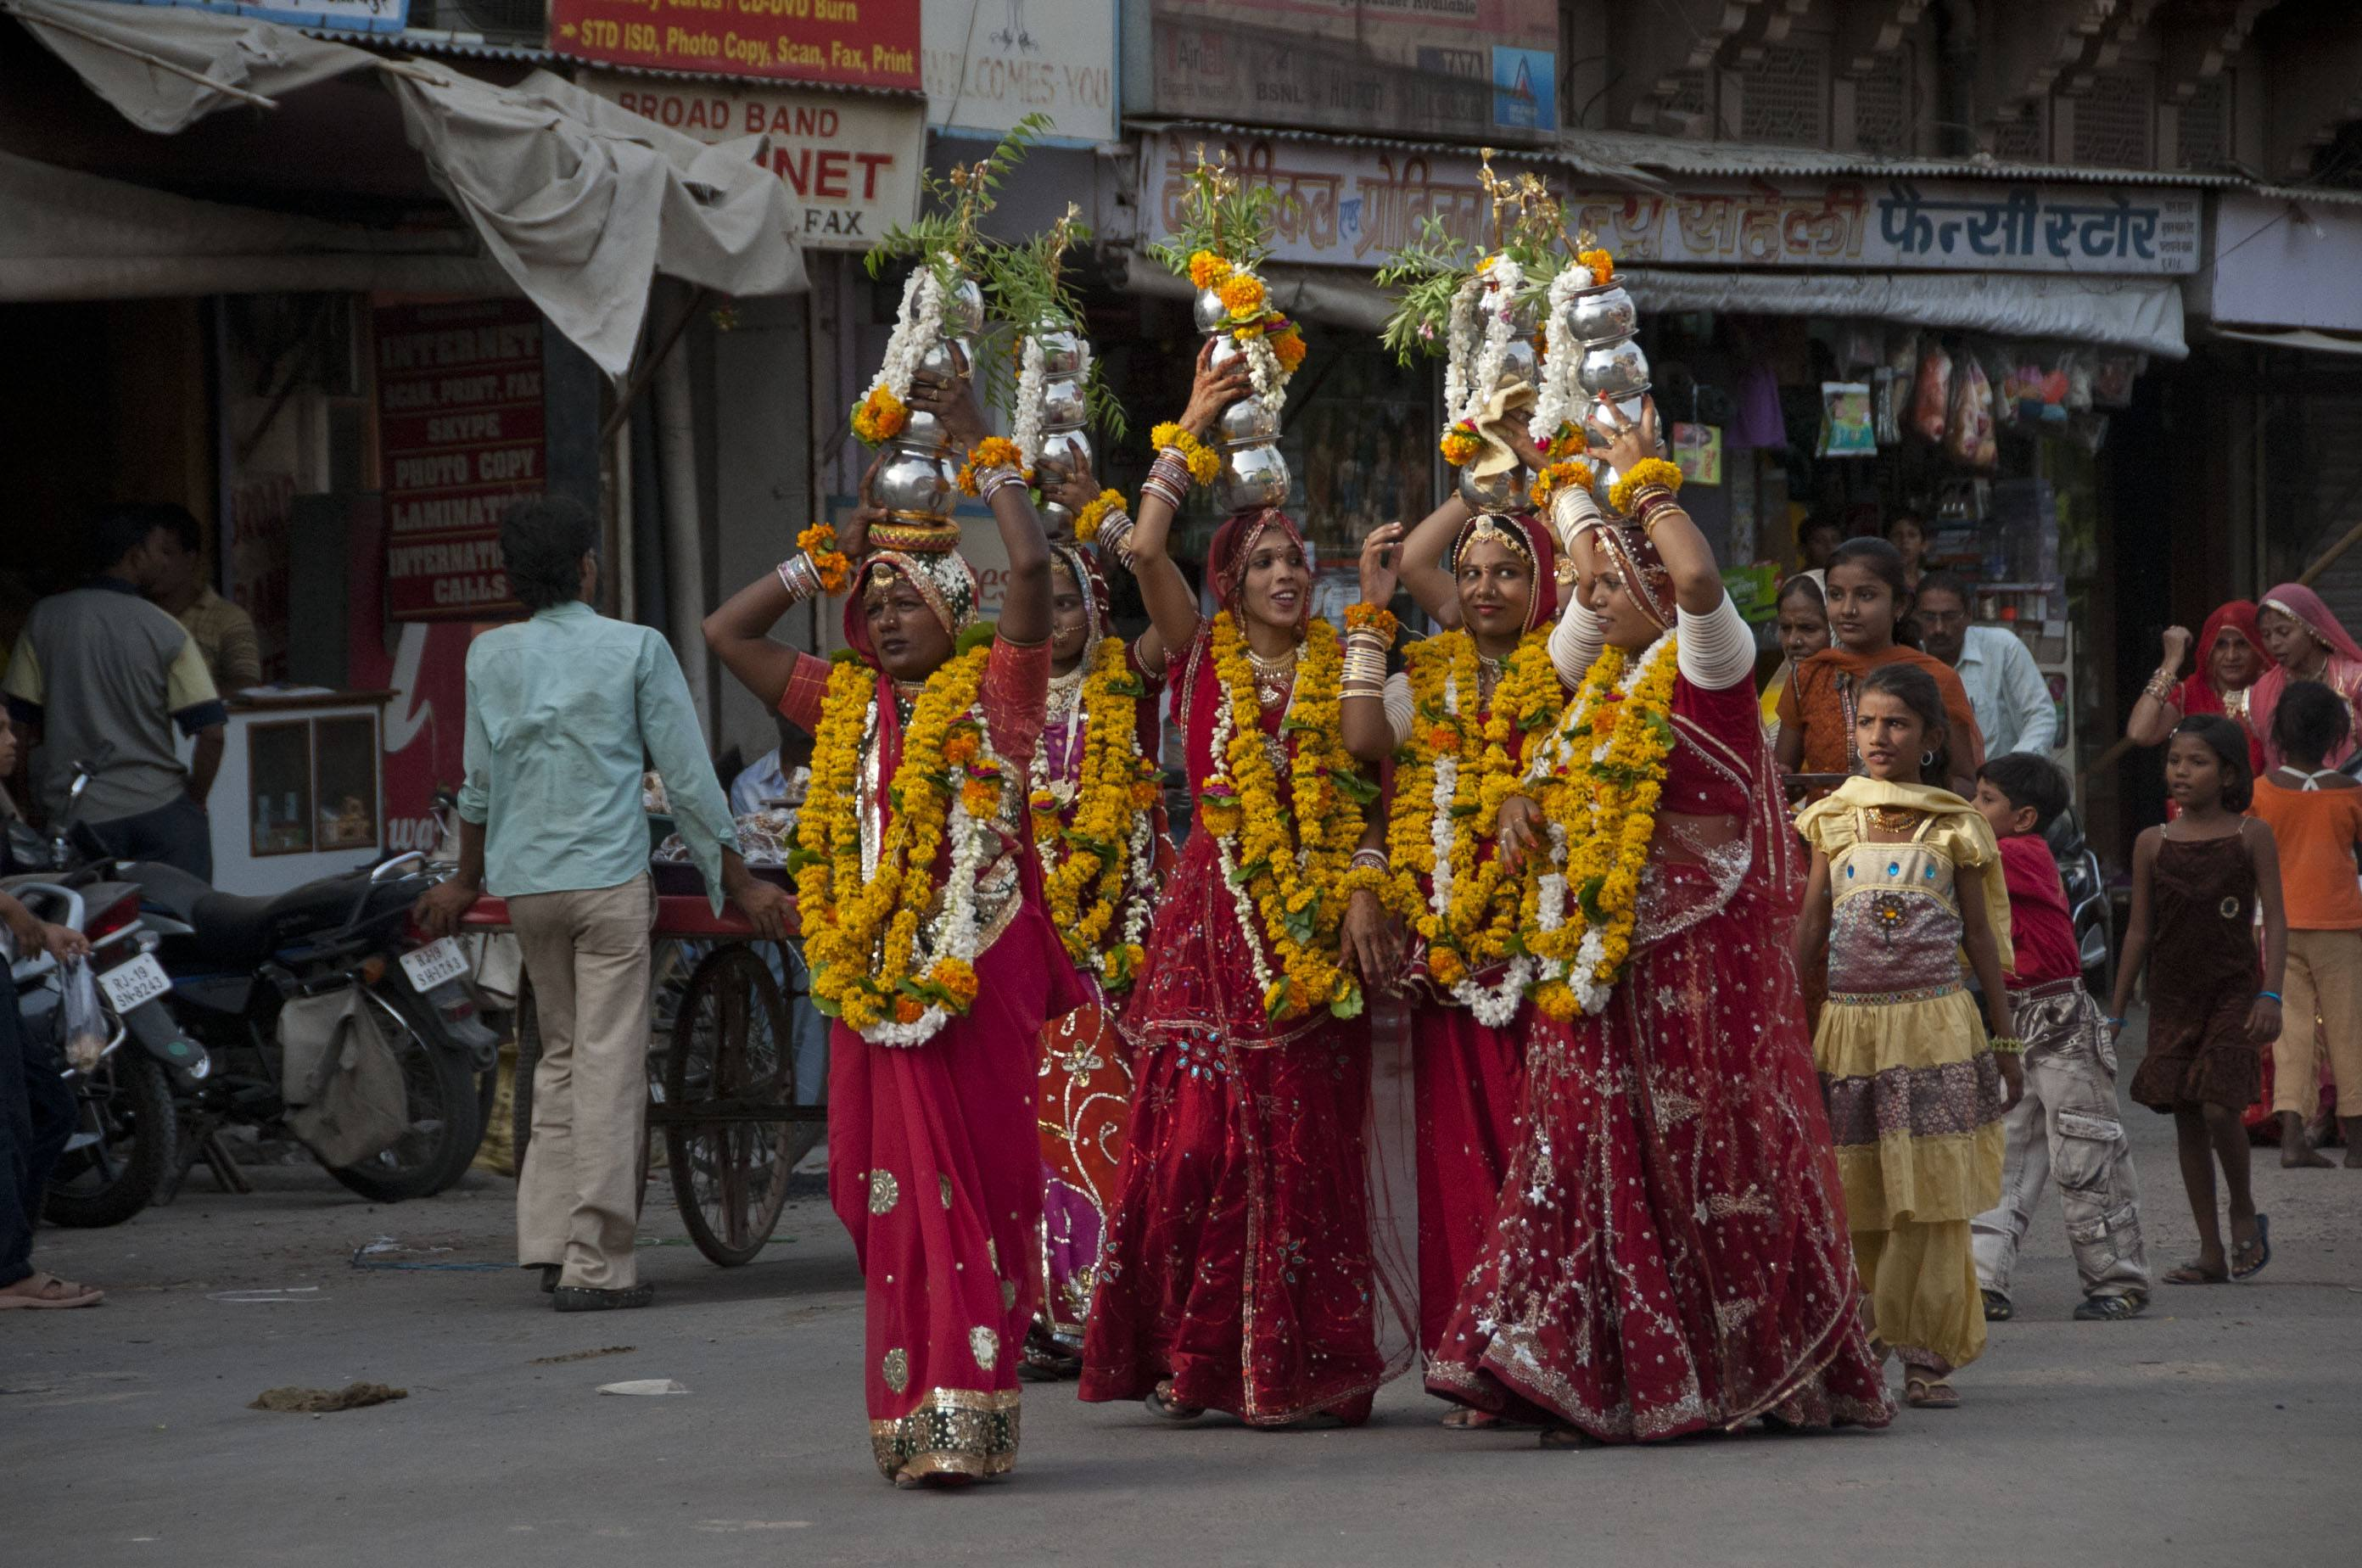 Jodhpur ladies group